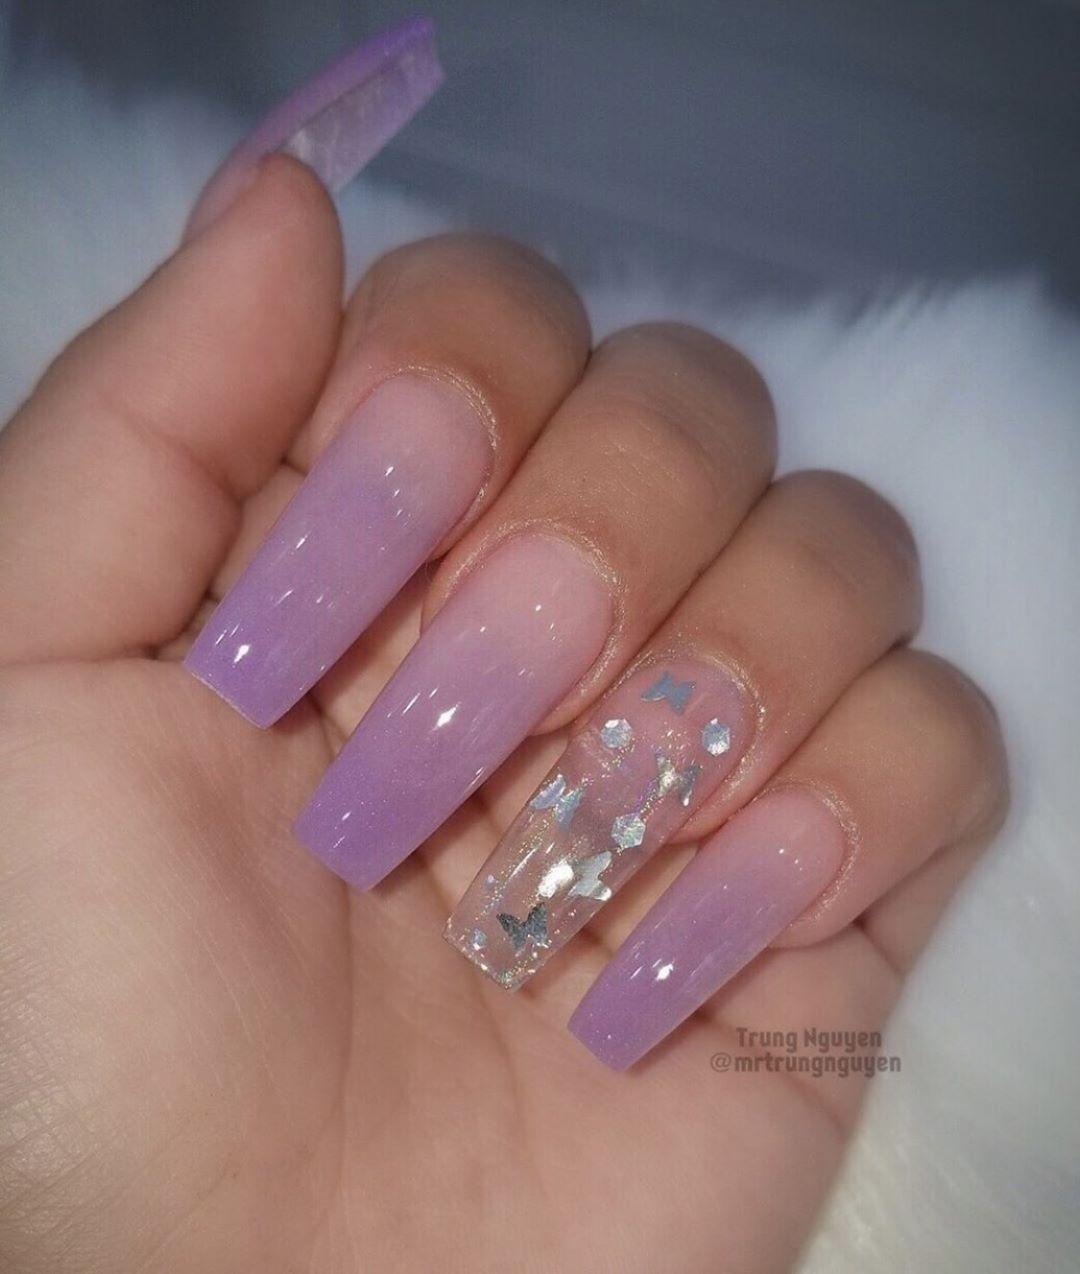 #nailsofinstagram #Nailblogger #nails#purplenails